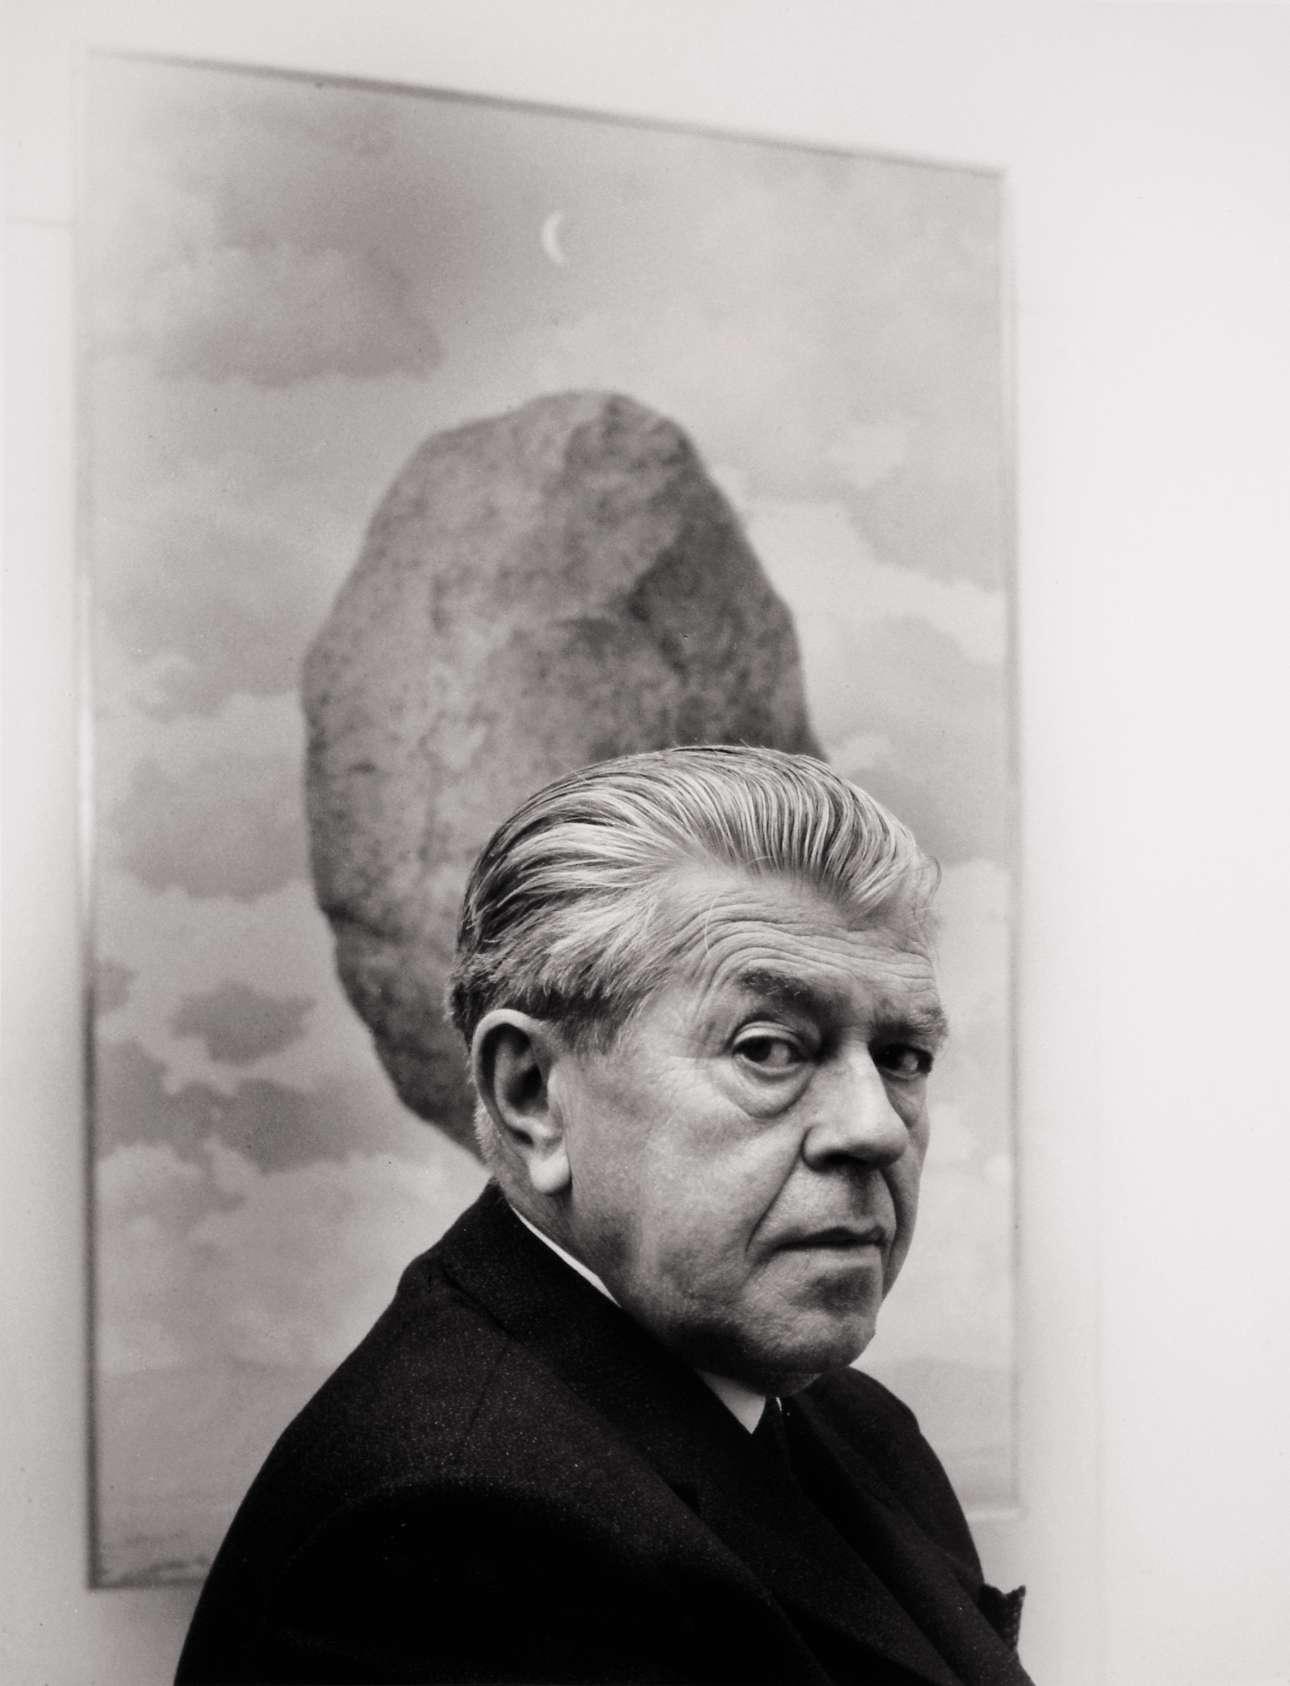 1_René Magritte_Shunk Kender_Rene Margitte in front of Le sens de realite